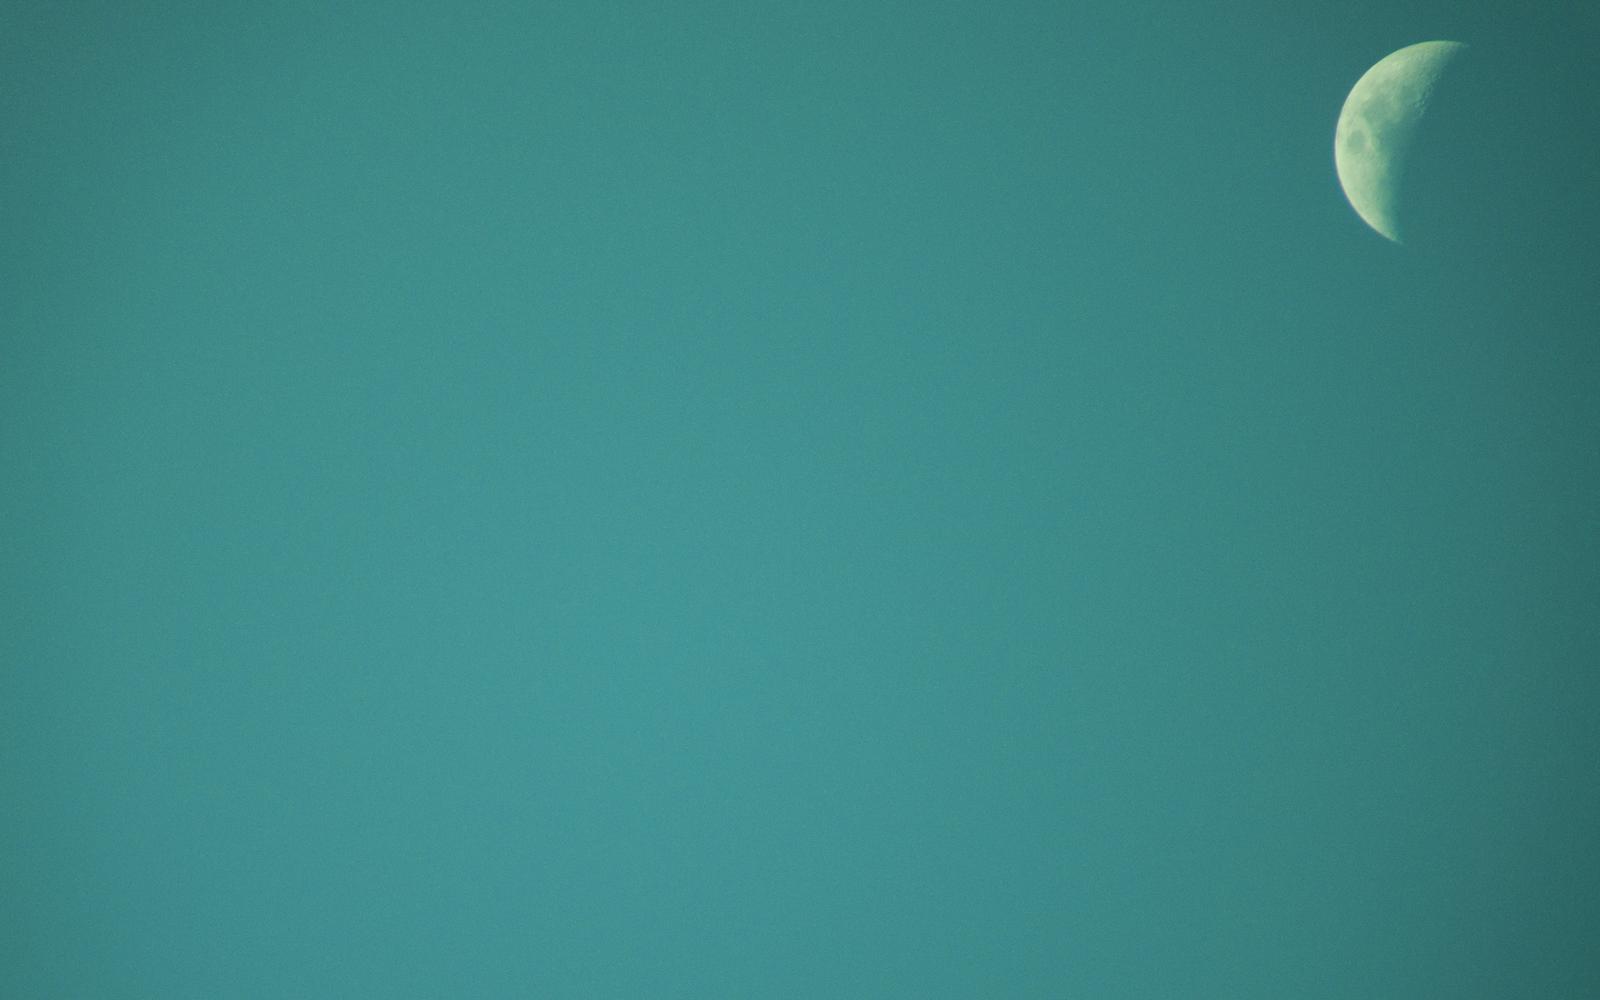 Desktop Wallpaper Free Download For Windows 8 Home Interior Design